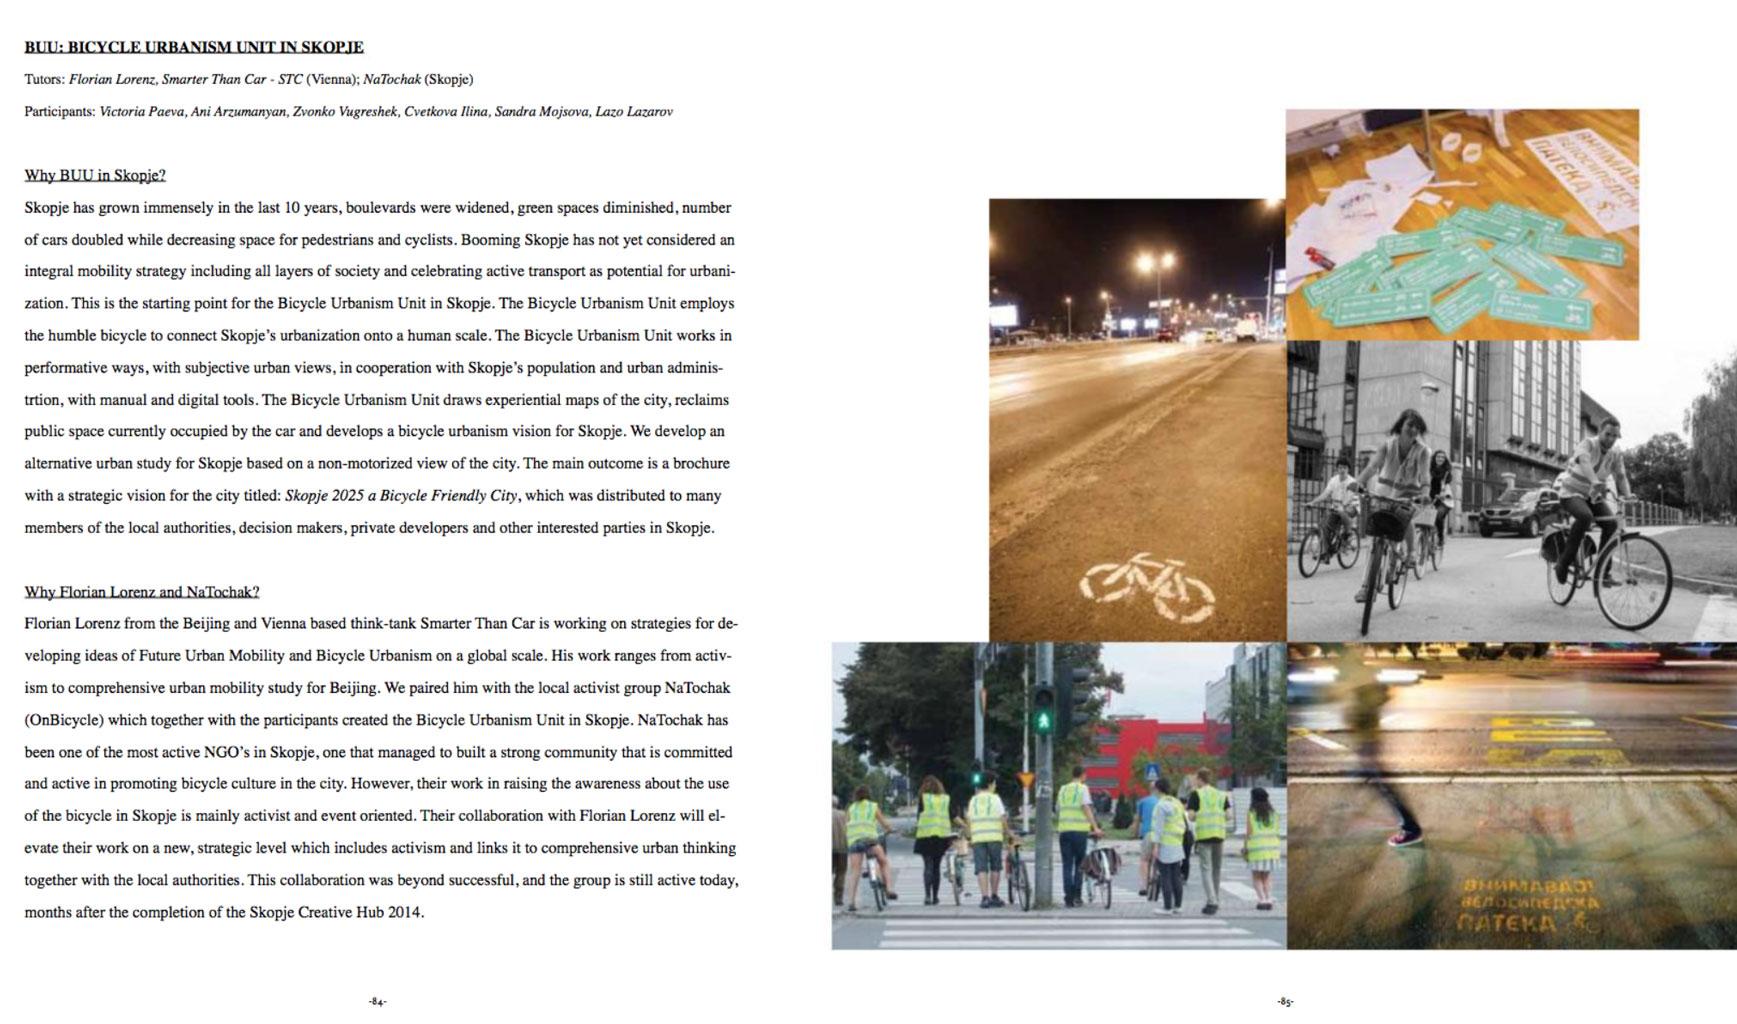 2015_STC_Bicycle-Urbanism-Unit_CCN